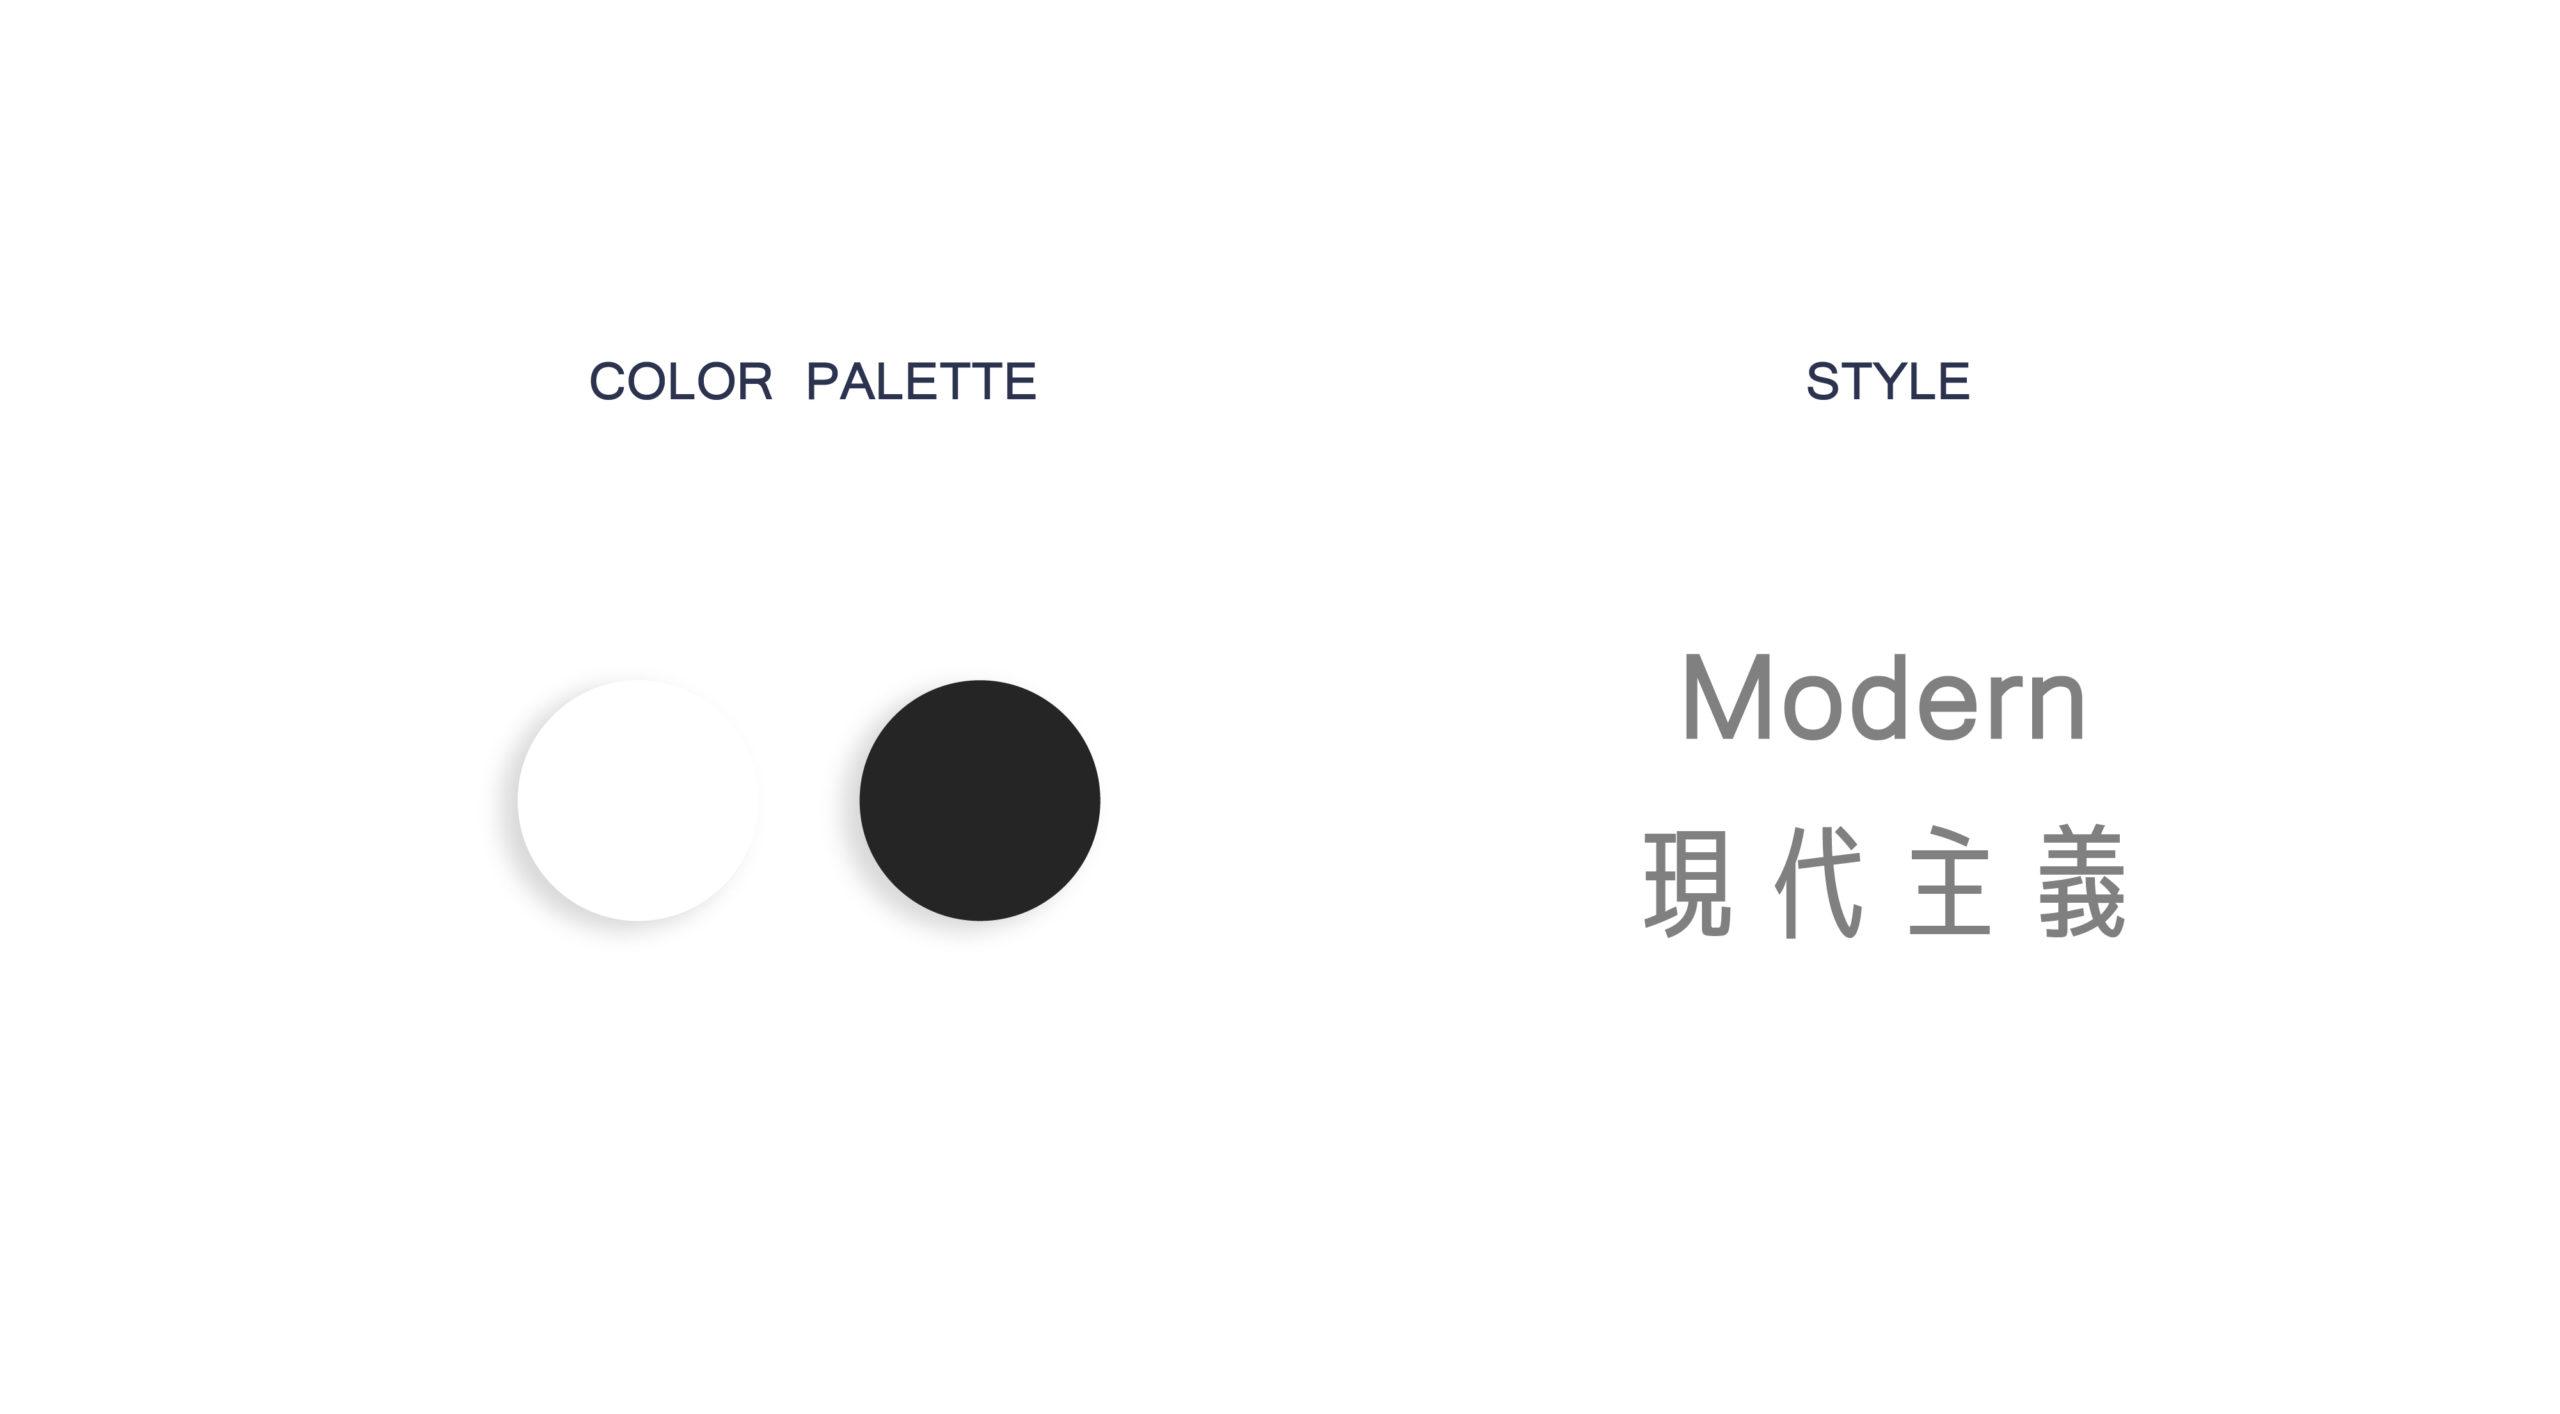 艾肯斯_官網_portfolio更新_1205-21-scaled.jpg